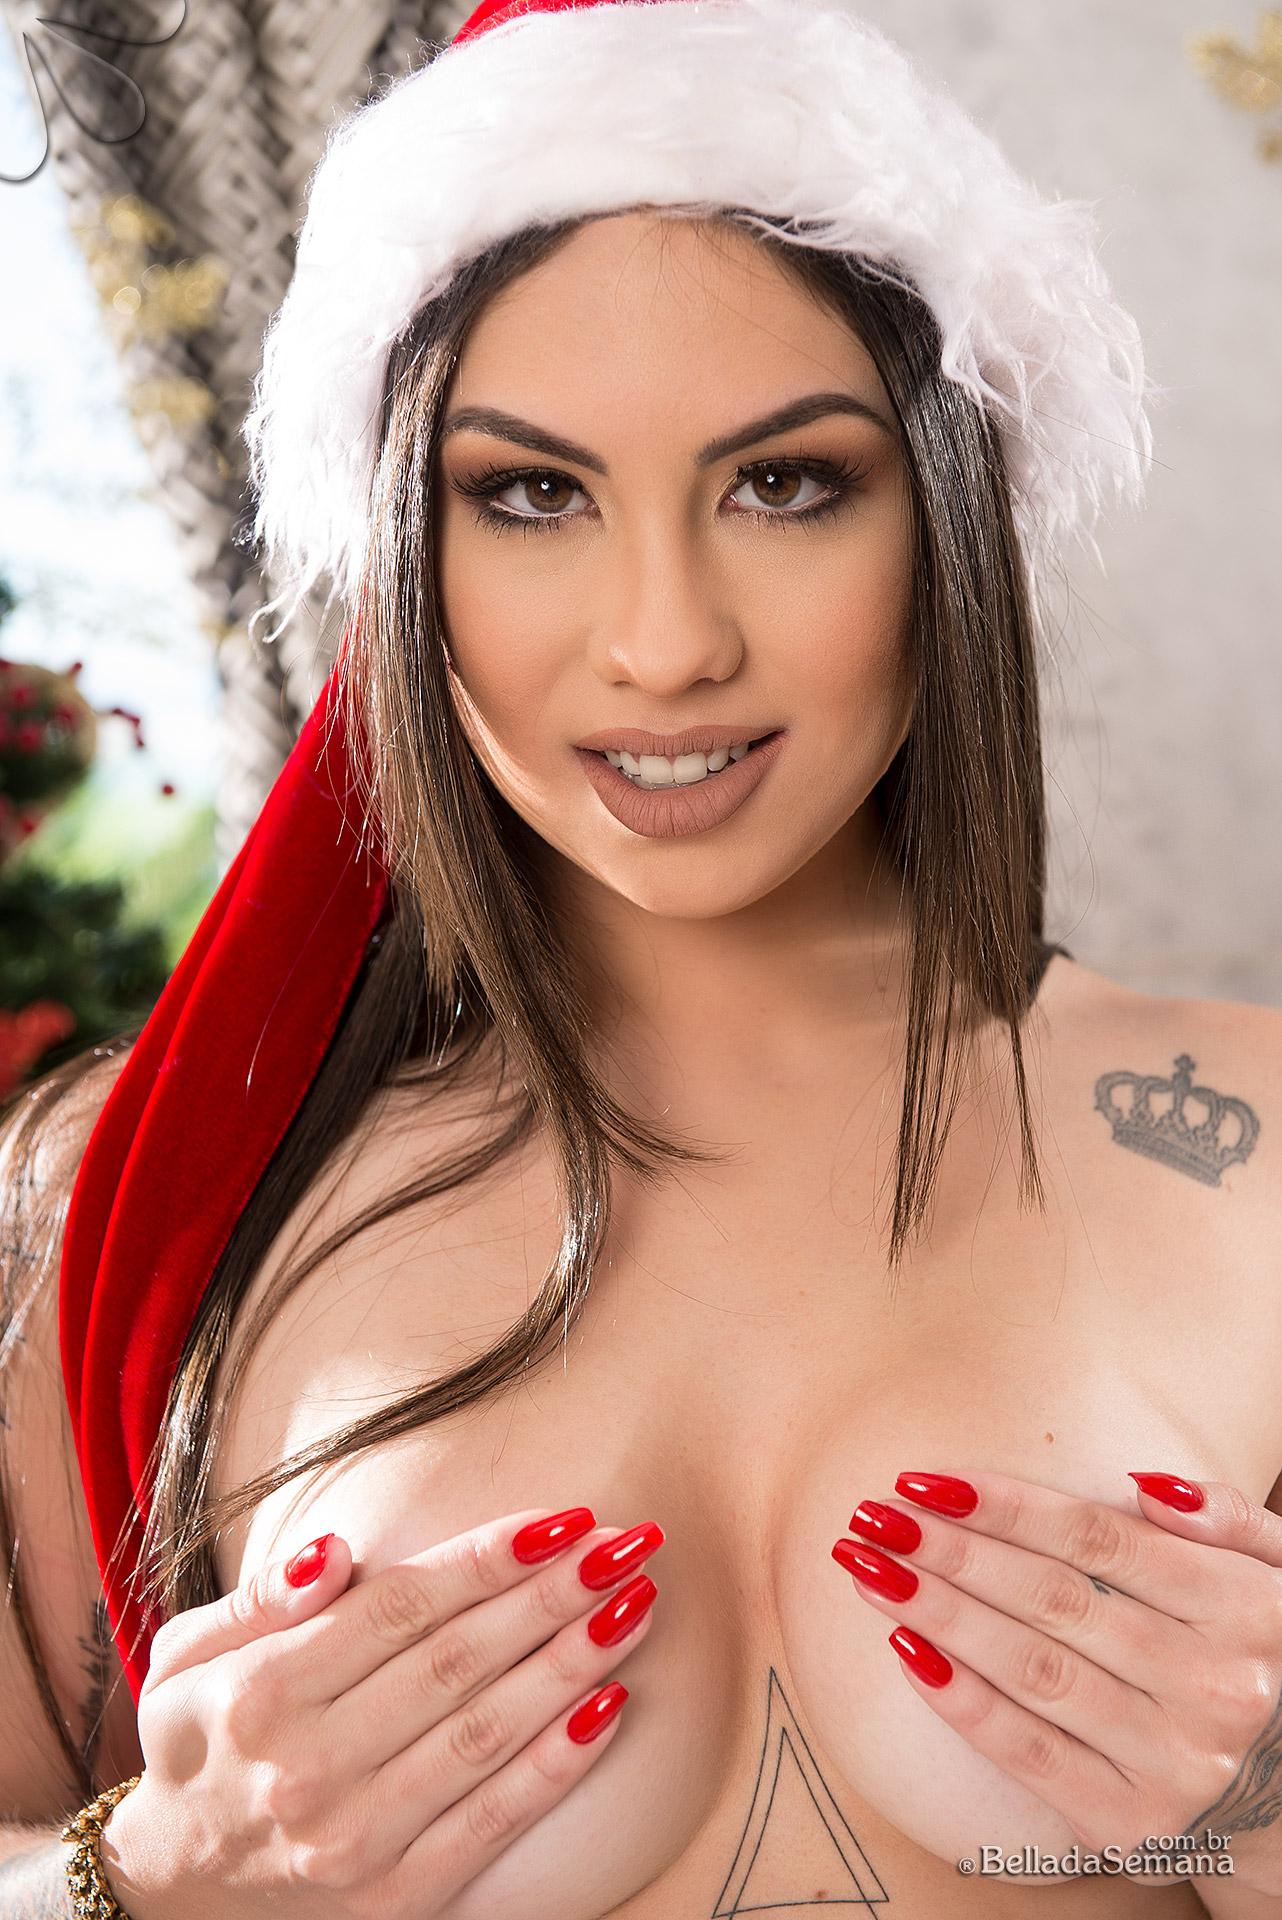 Especial de Natal da Bella da Semana: Emiliana Agacci